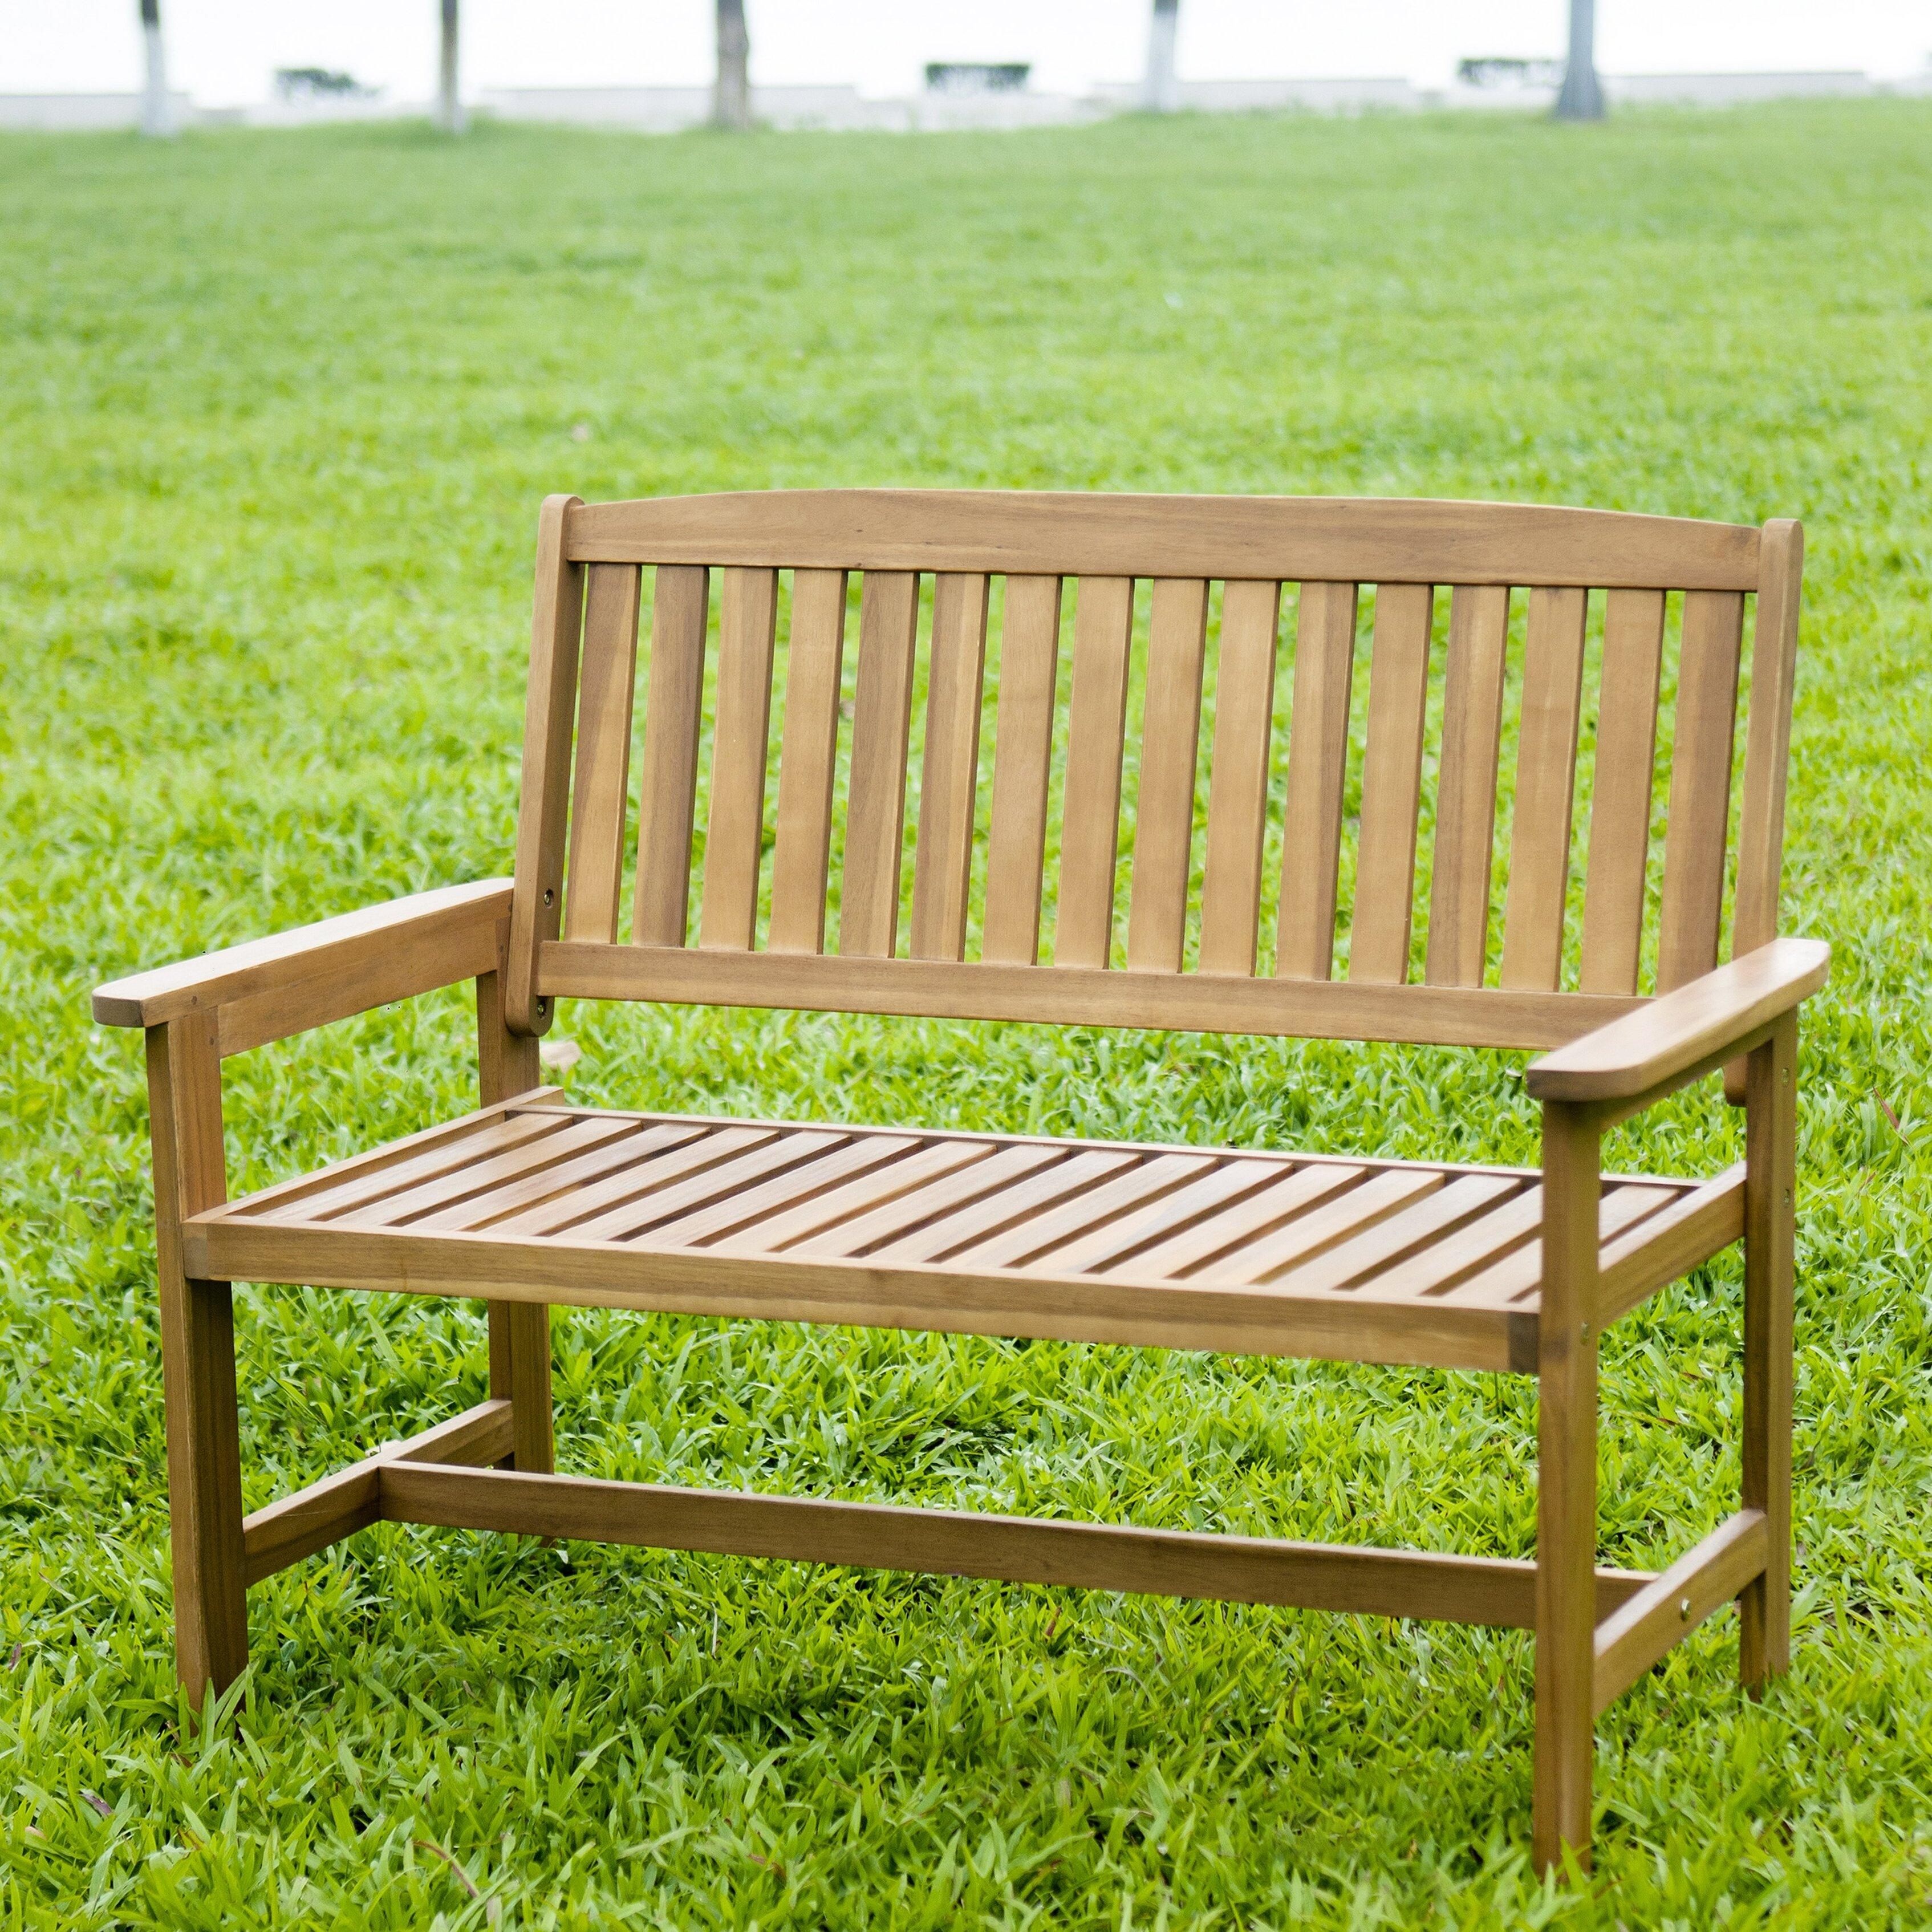 HRH Designs Wood Garden Bench Reviews Wayfairca